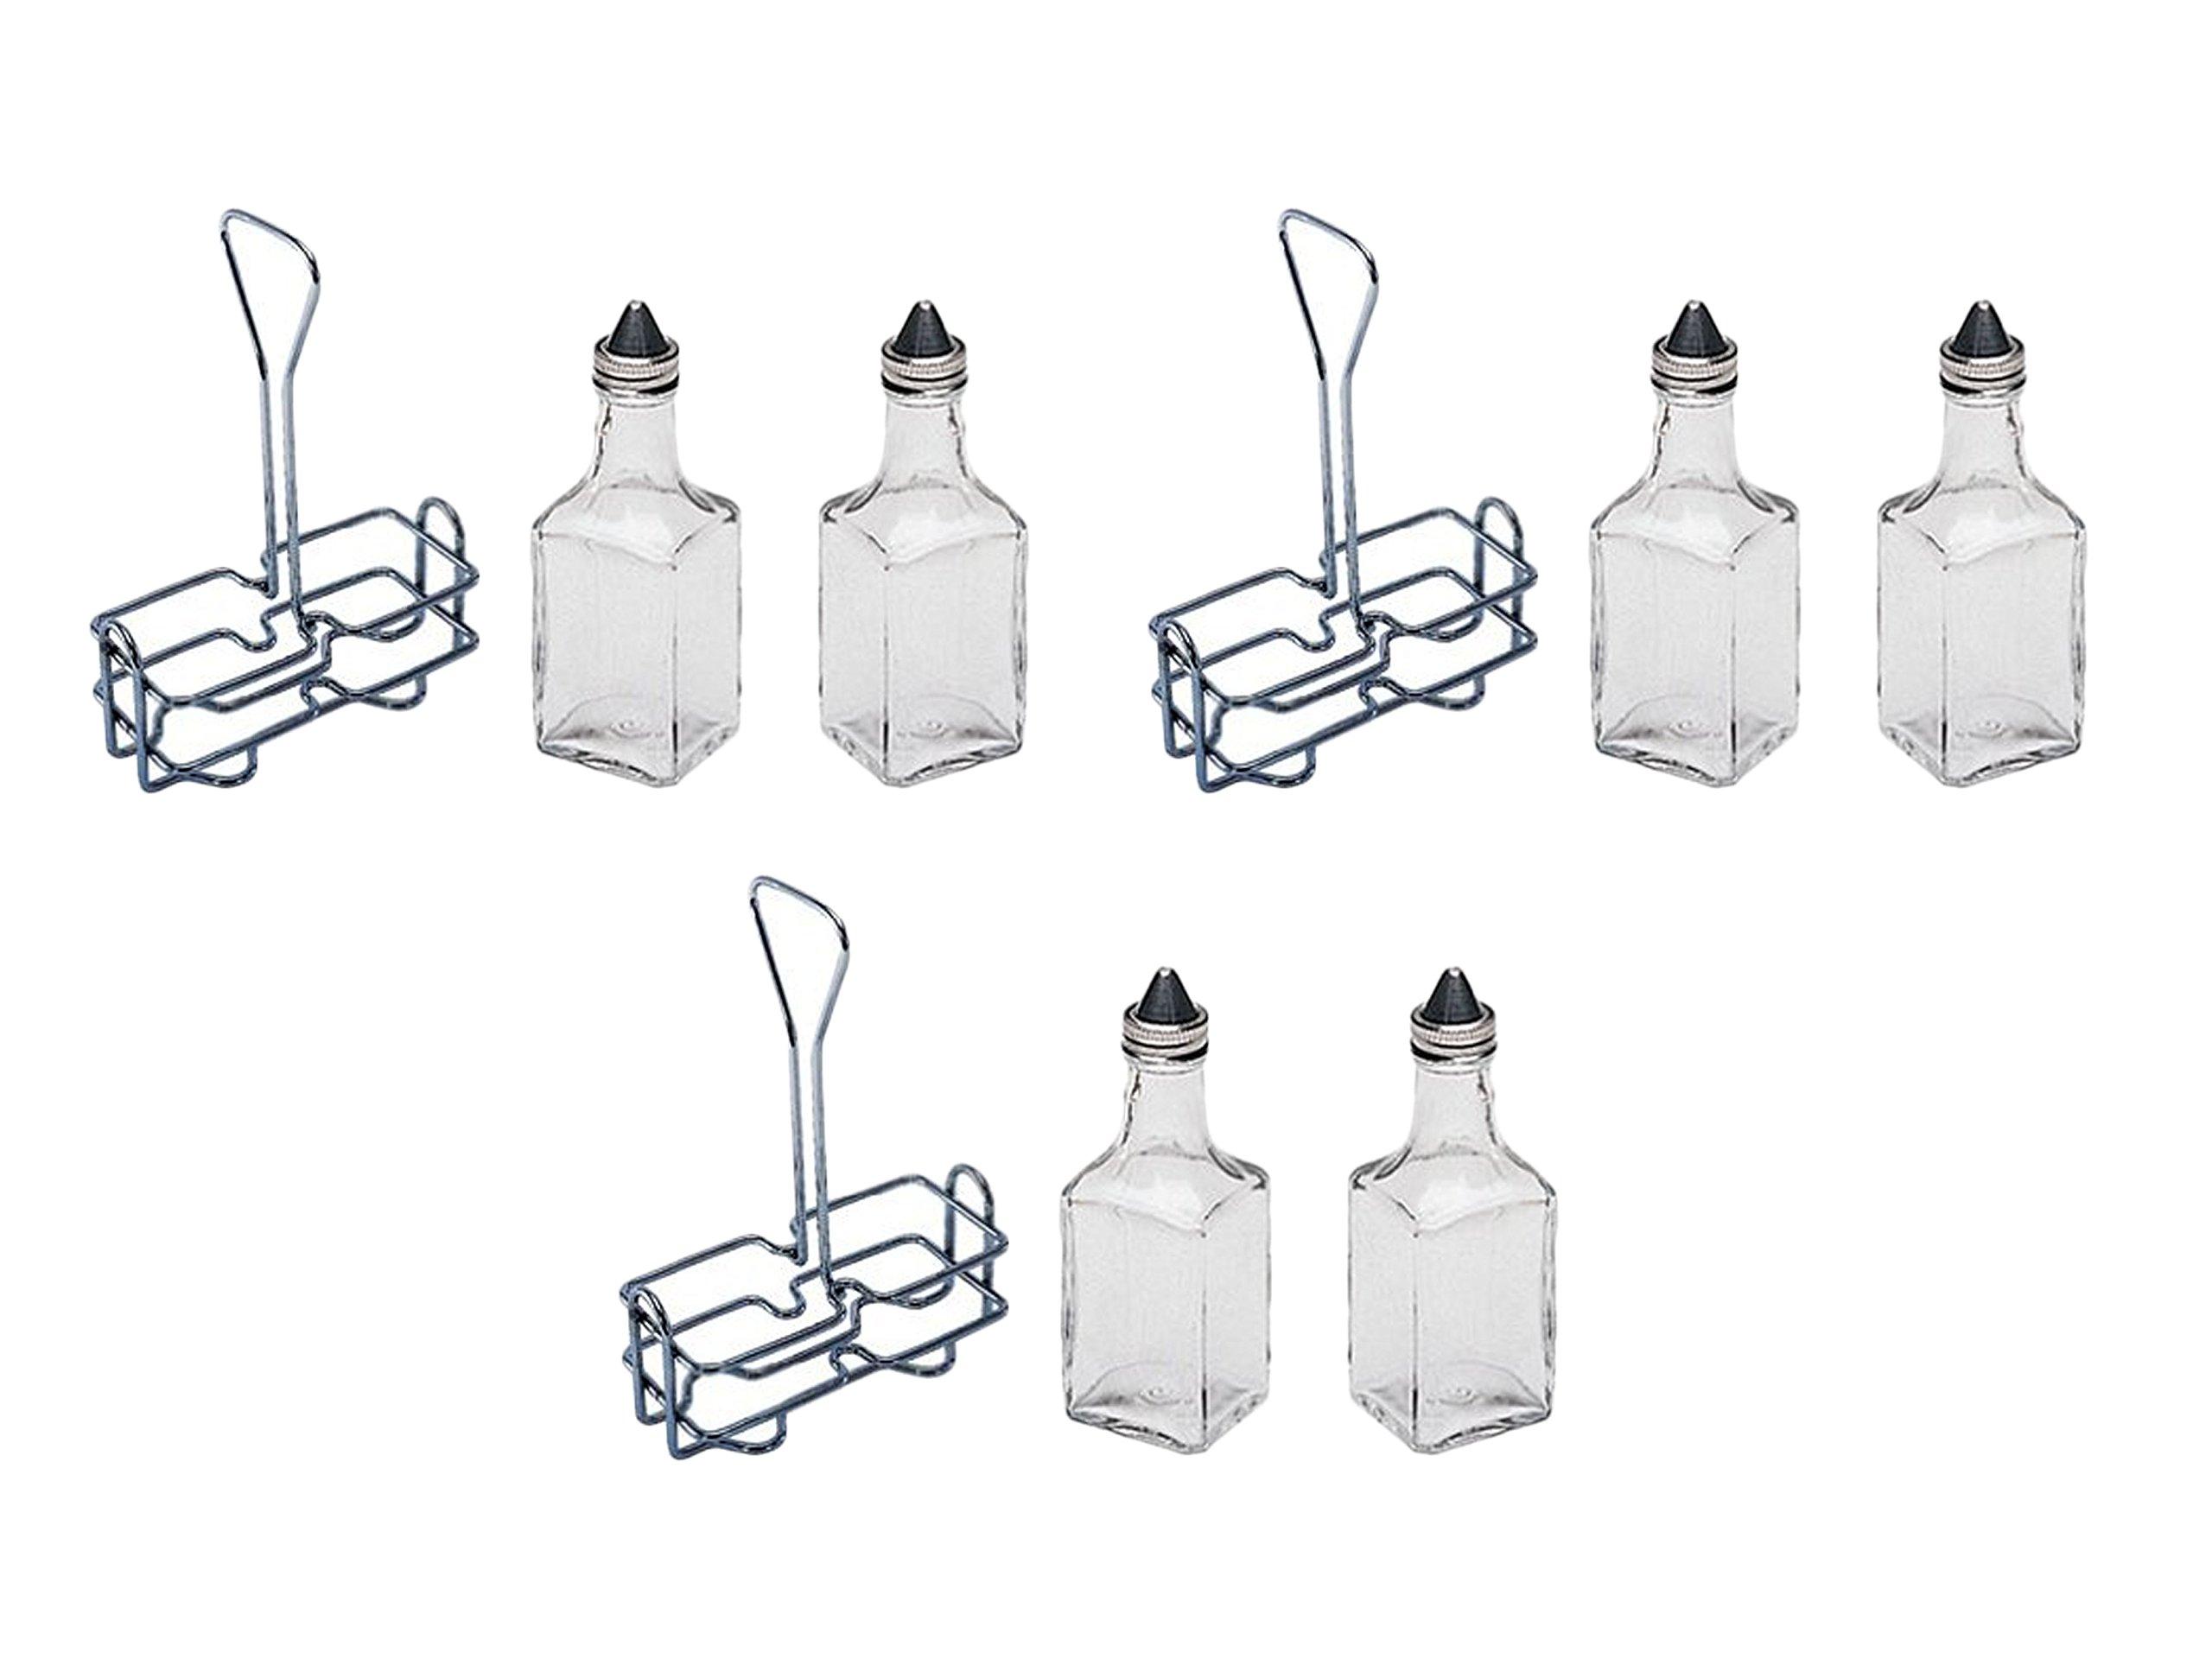 3 Set of 2 Update 6 oz. Tabletop Oil and Vinegar Cruet Glass Bottle Cruets Dispenser w/Chrome Plated Caddy Holder bundled by Maven Gifts